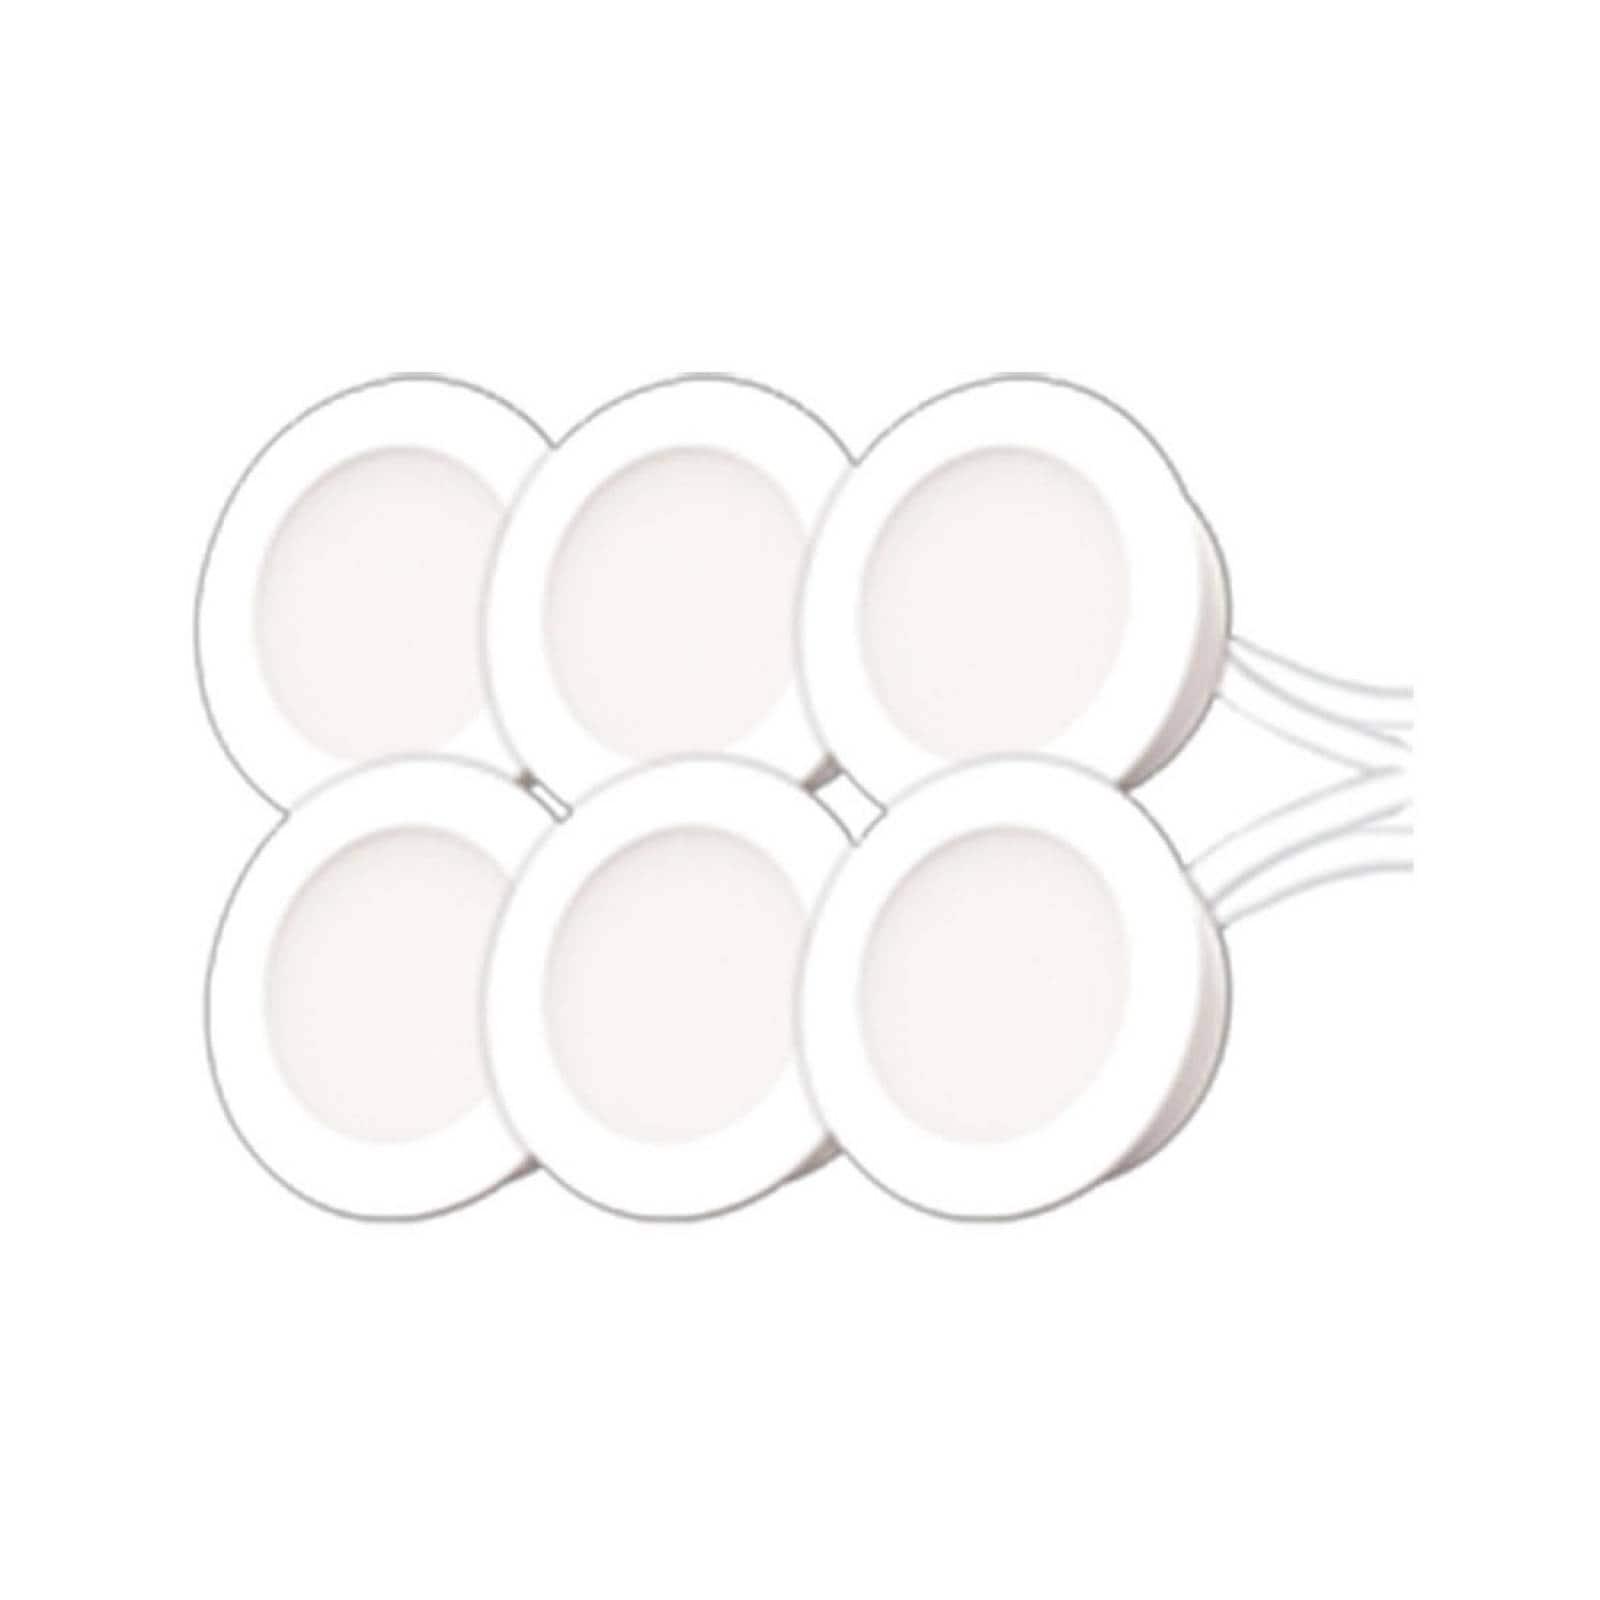 Kit 6 pzas Empotrado Piso Blanco Ad-5493 Adir